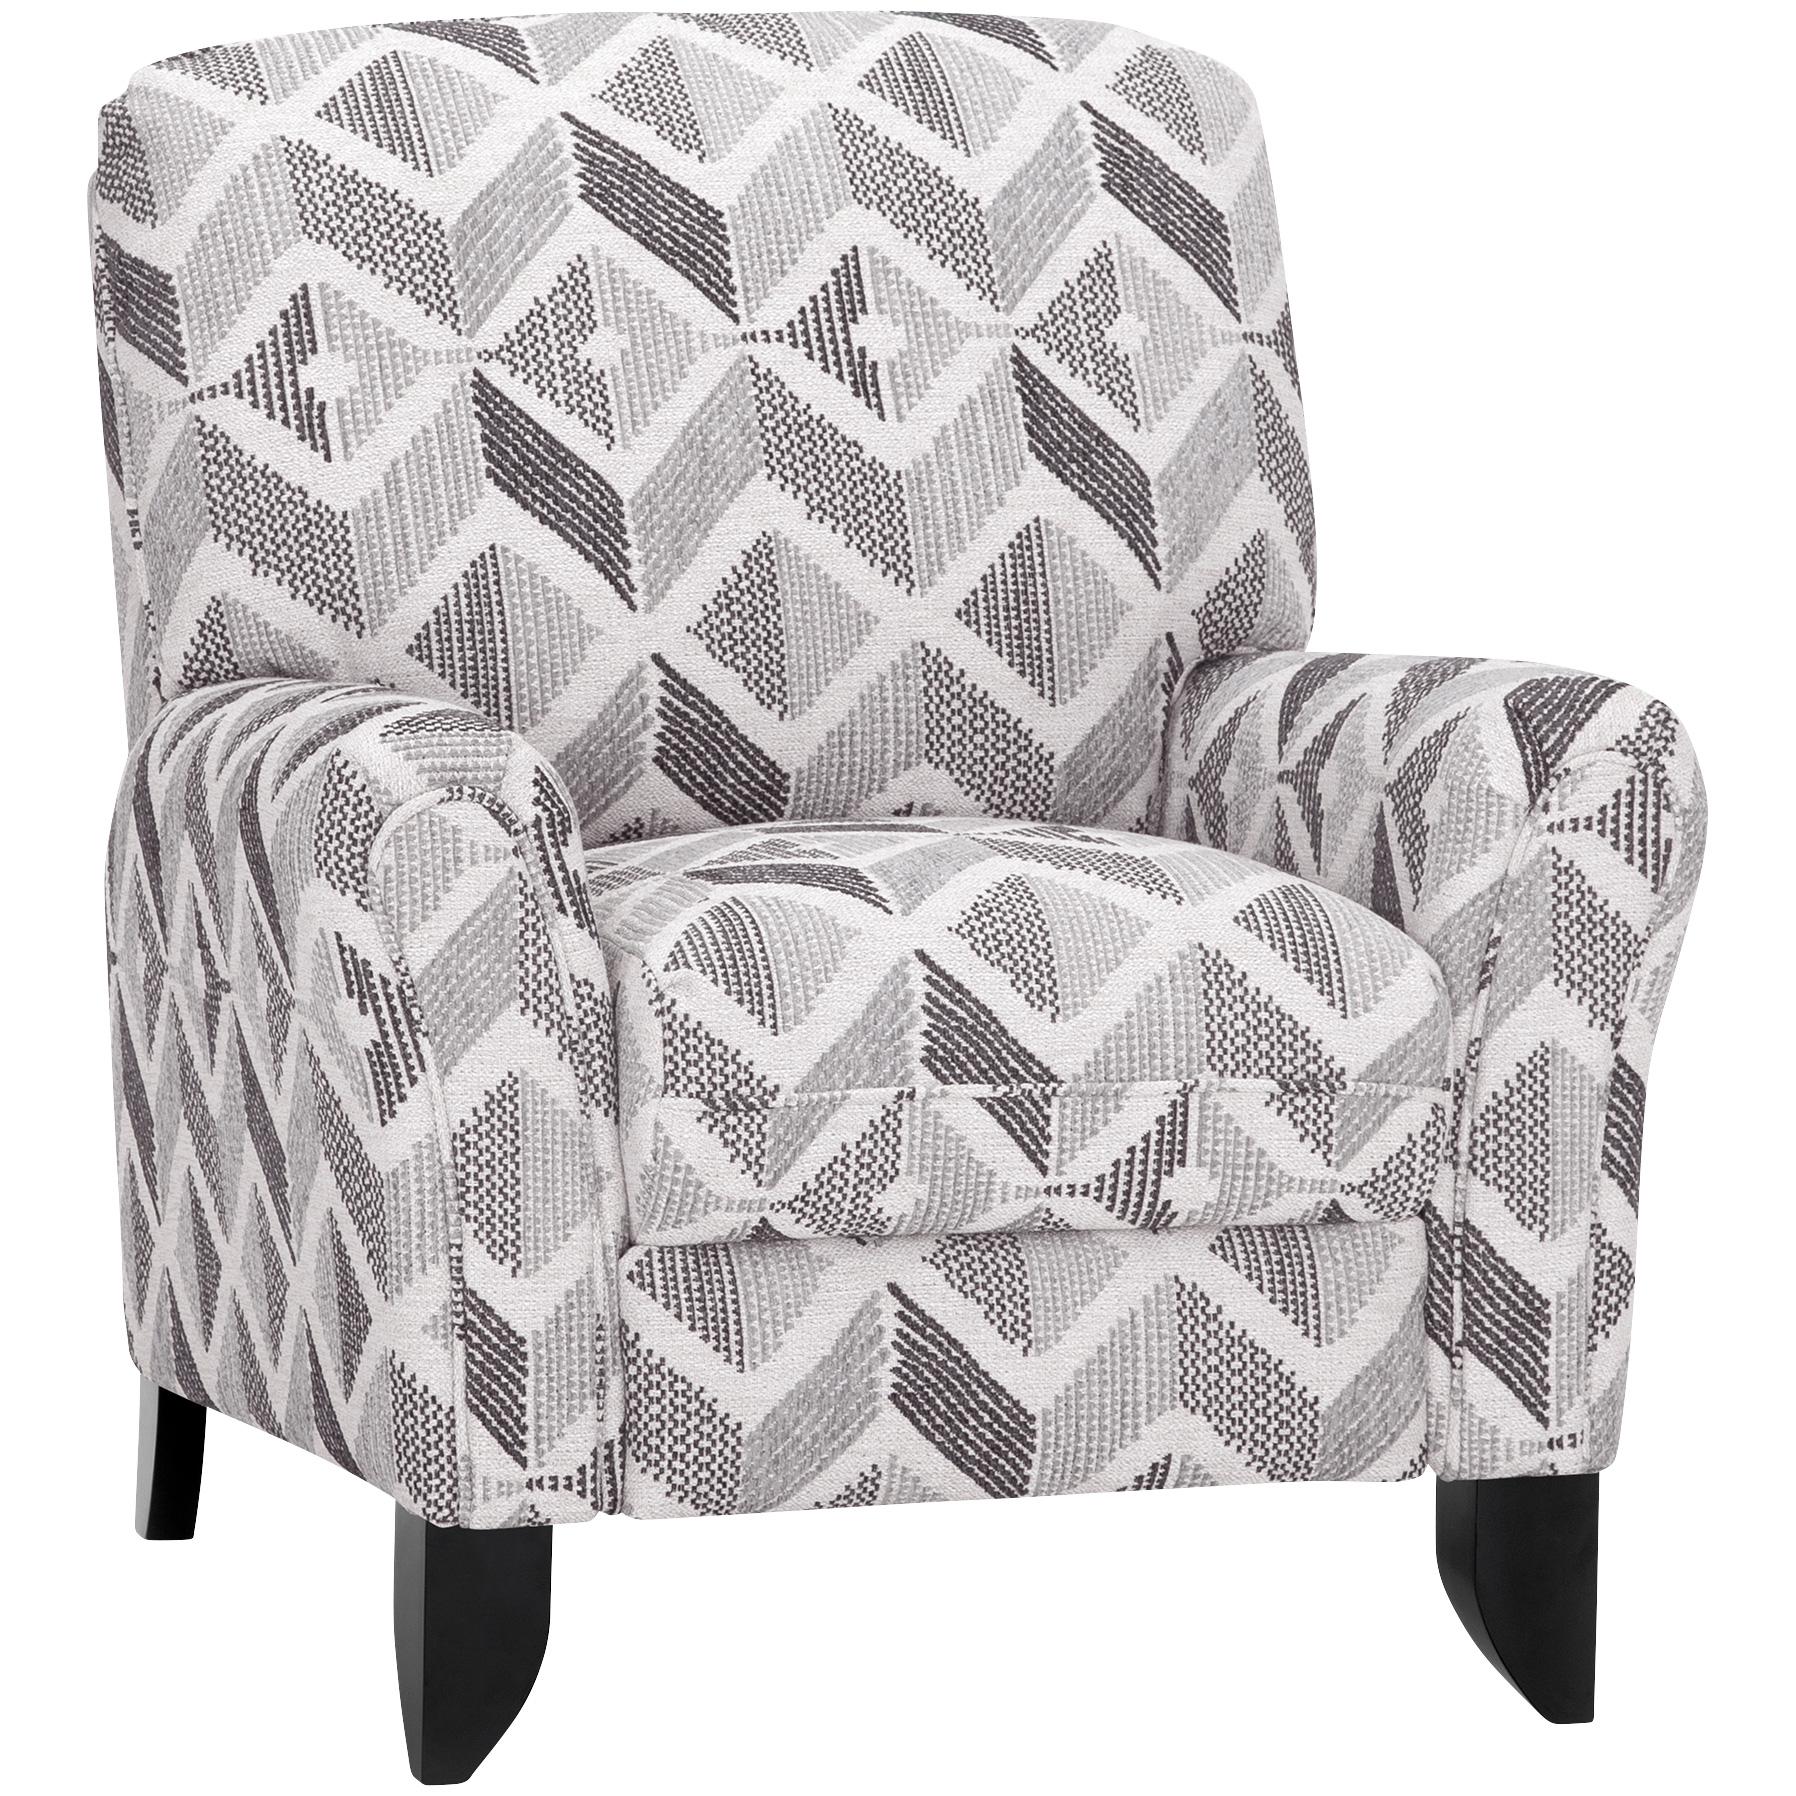 Franklin | Avanti Stone Leg Recliner Chair